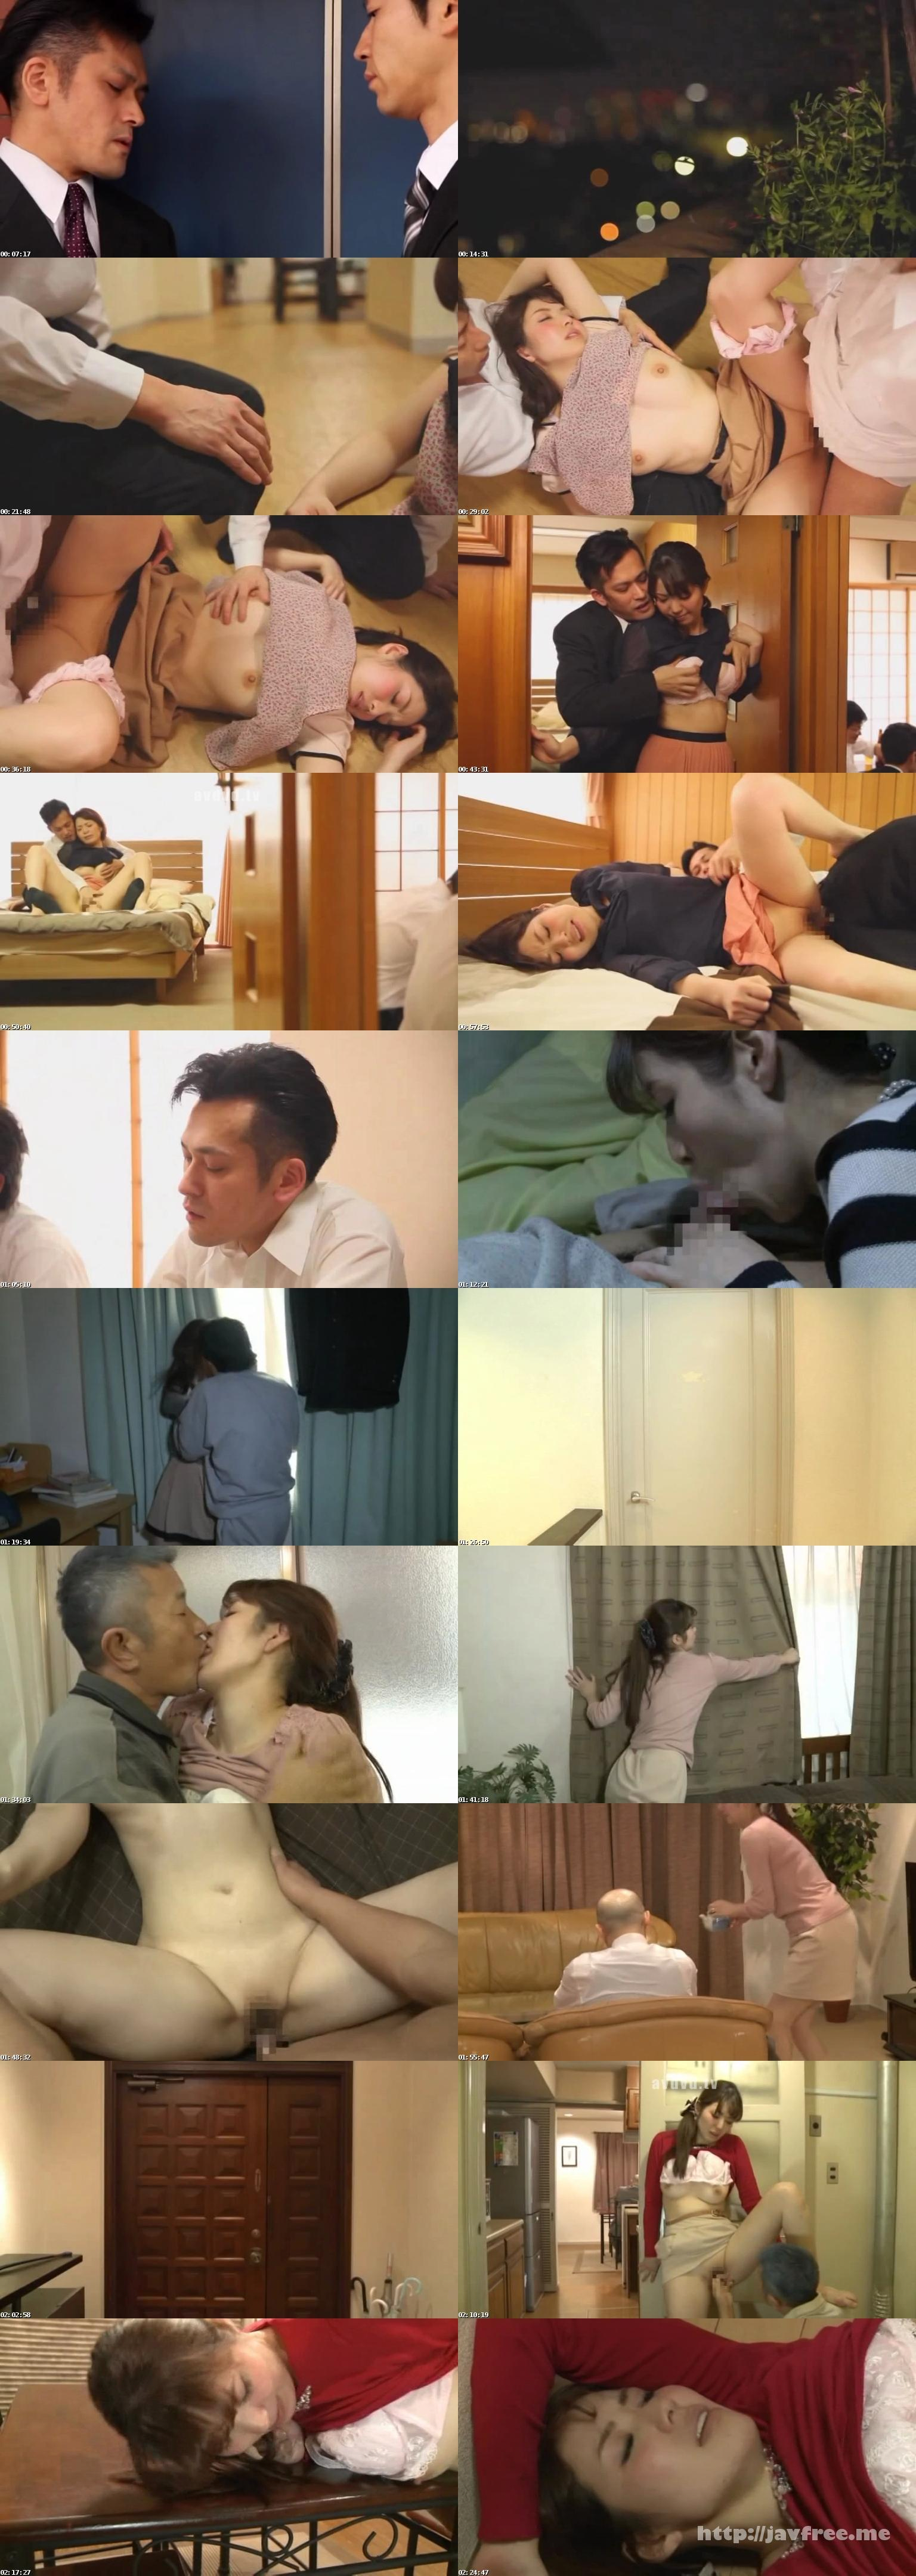 [SBCI-065] 女らしい最高の女優 愛乃ゆな THE BEST - image SBCI-065 on https://javfree.me